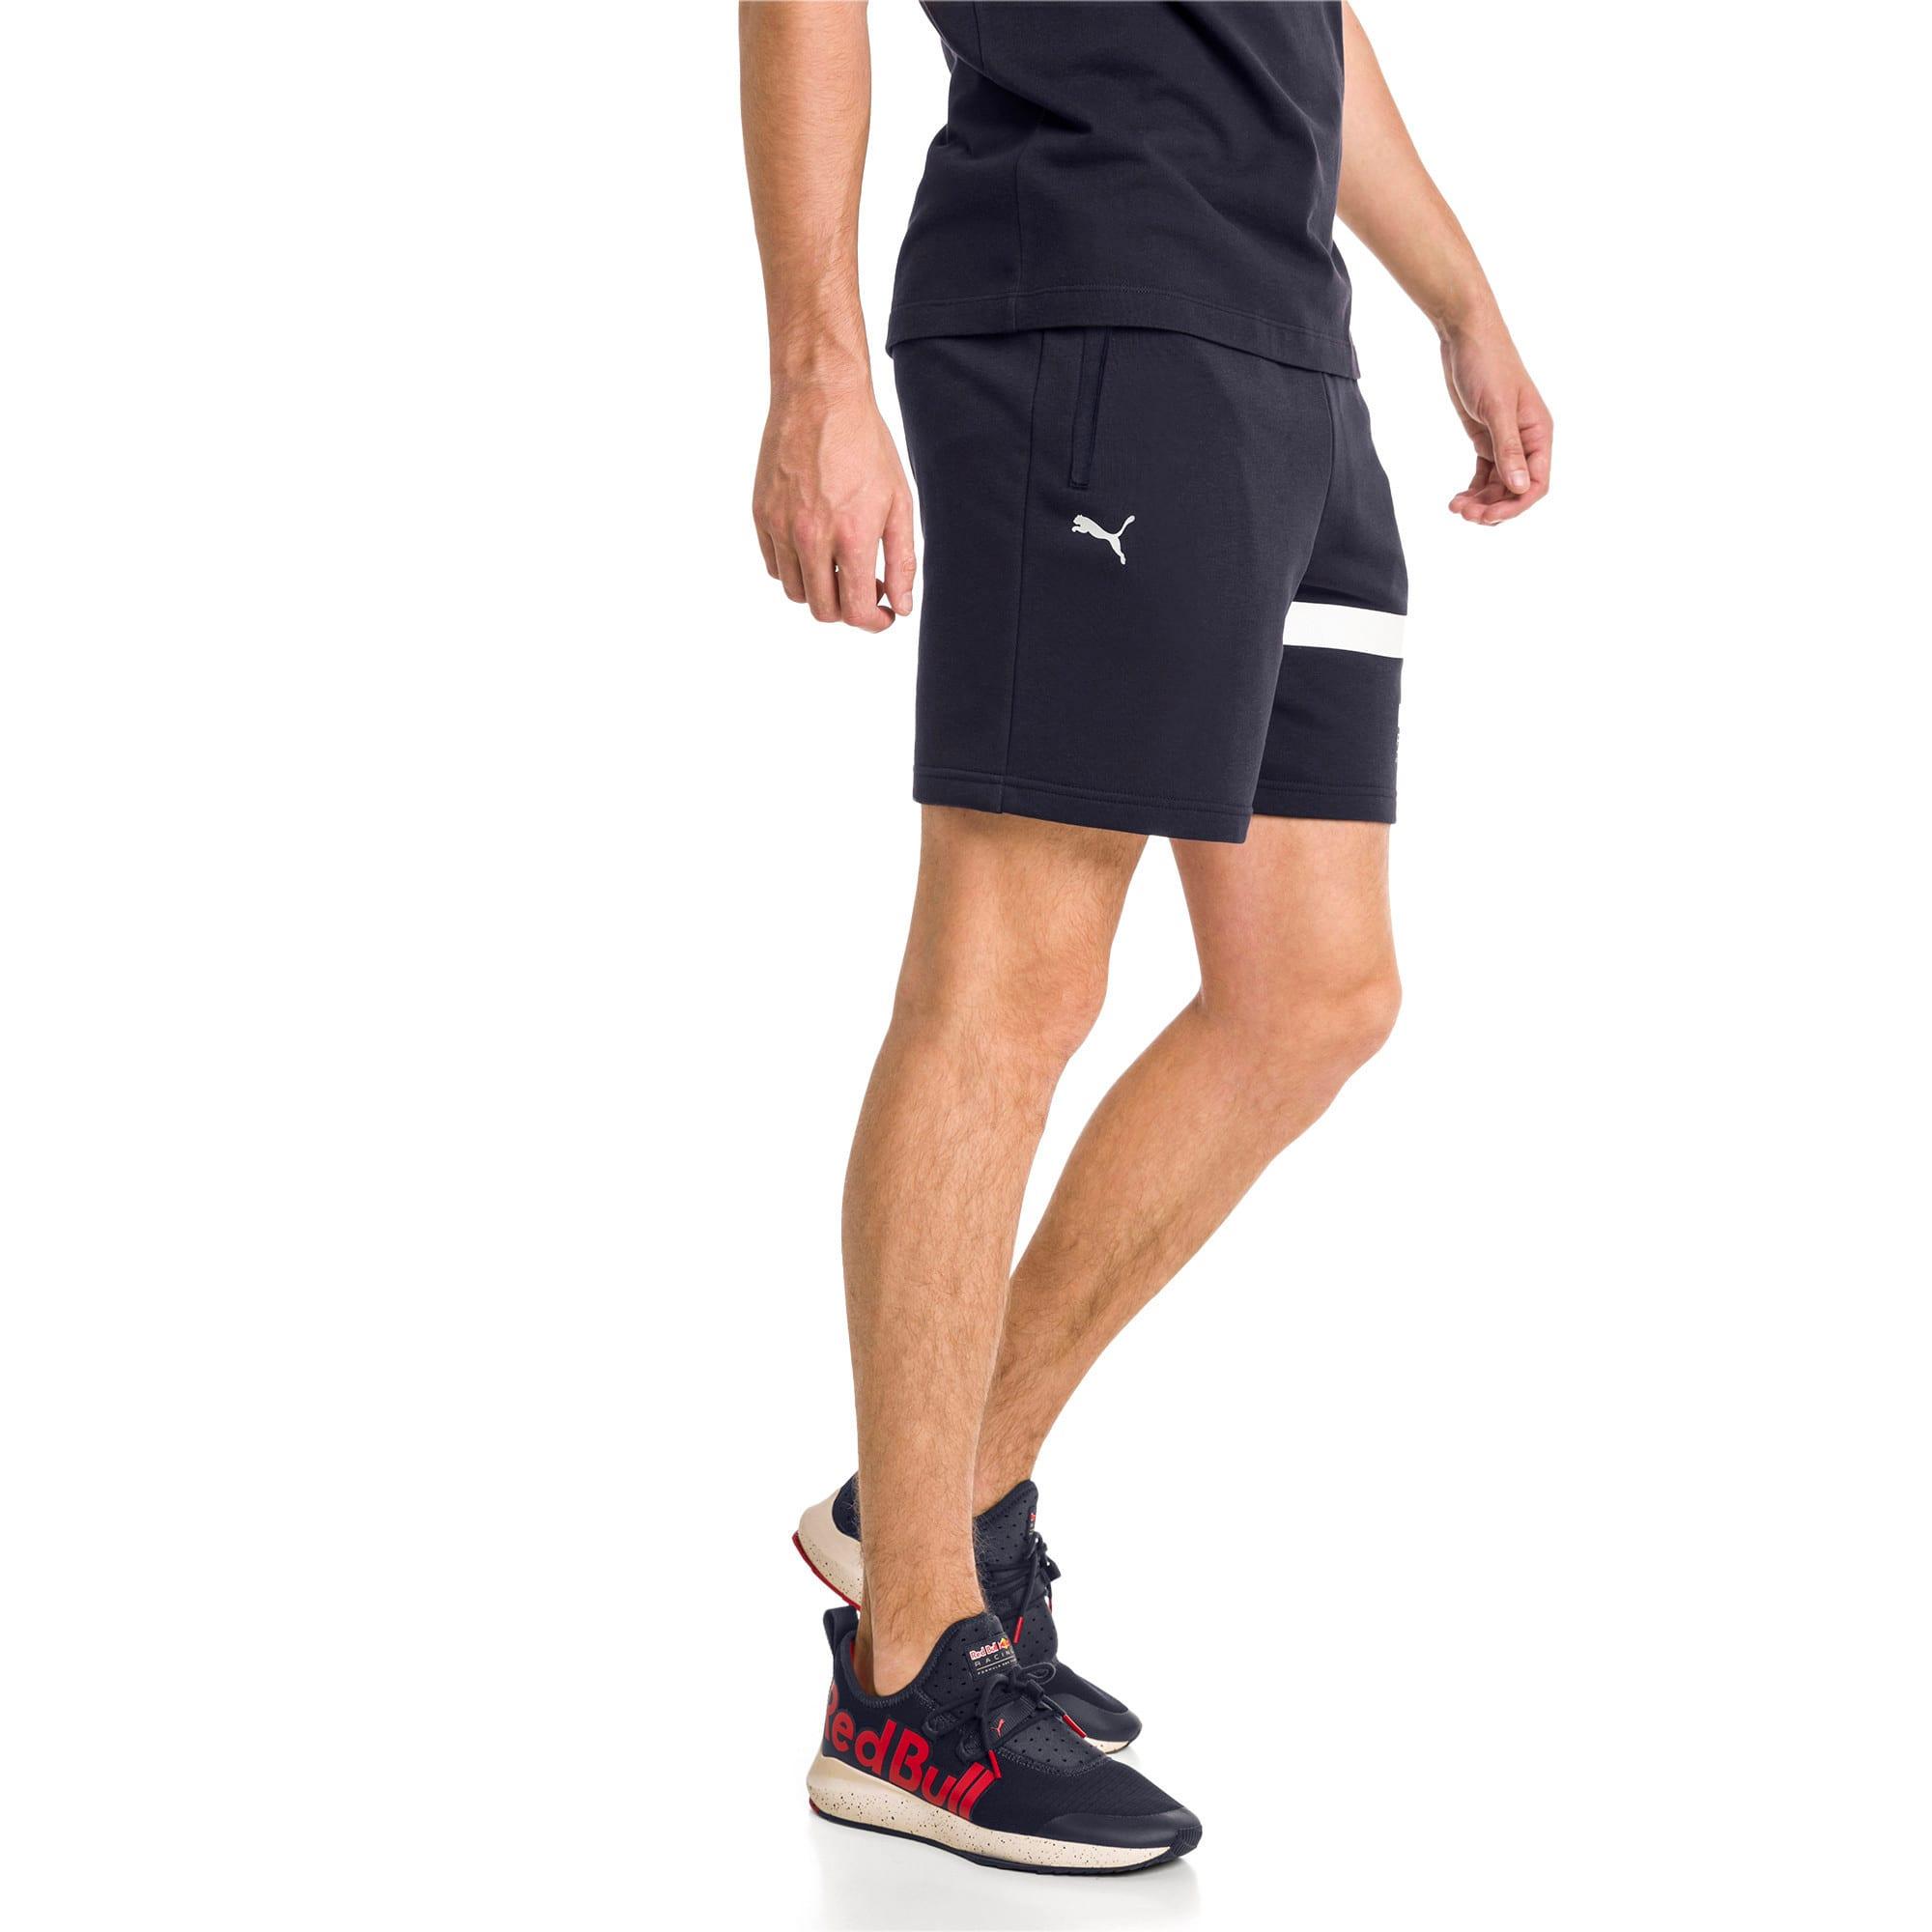 Thumbnail 1 of Red Bull Racing Logo Men's Sweat Shorts, NIGHT SKY, medium-IND